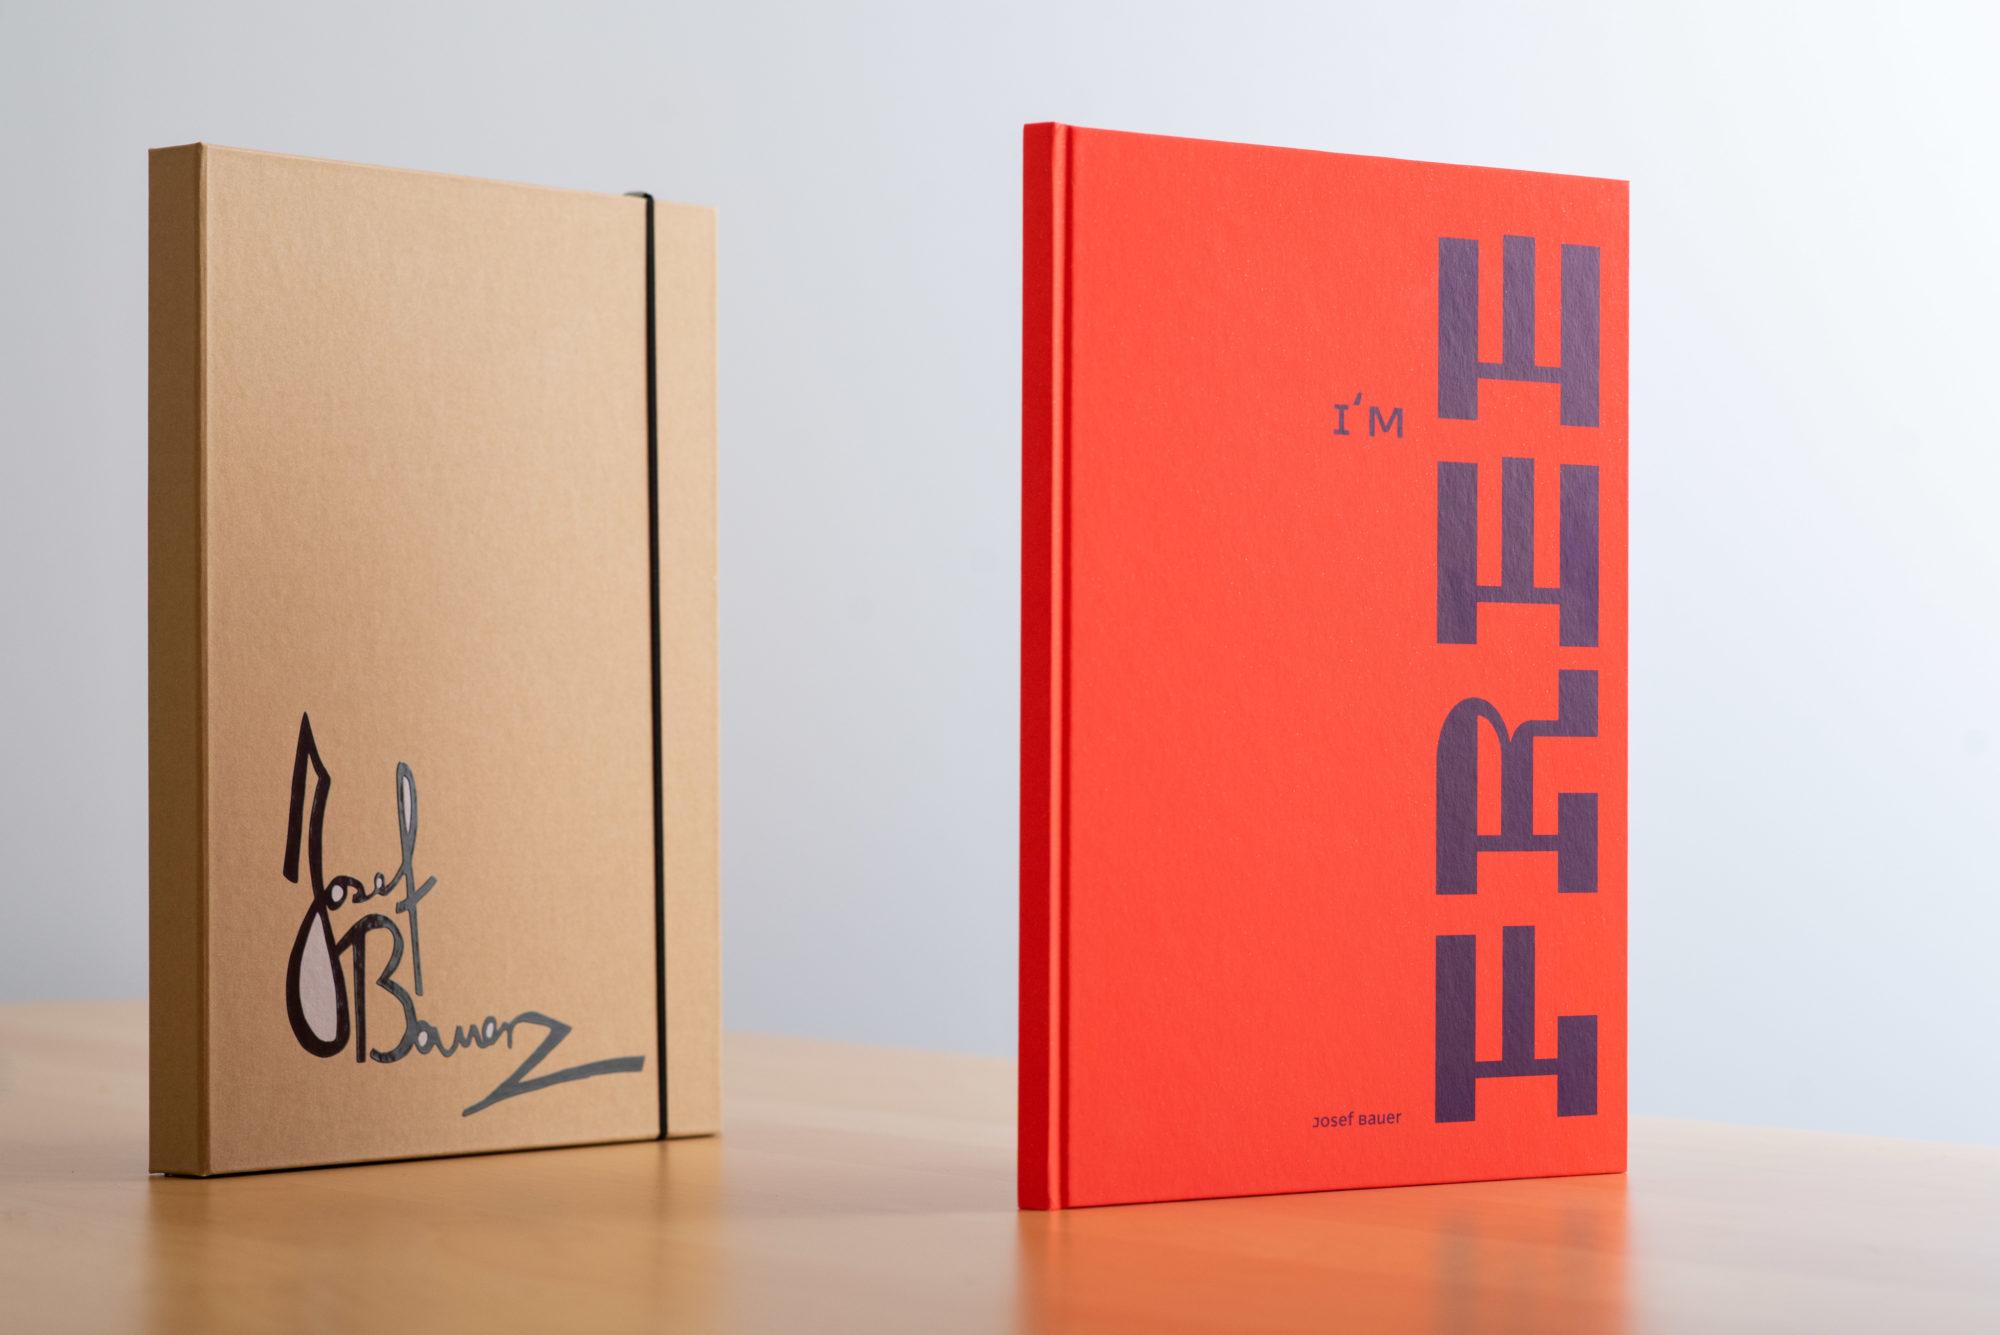 Josef Bauer Buch Cover